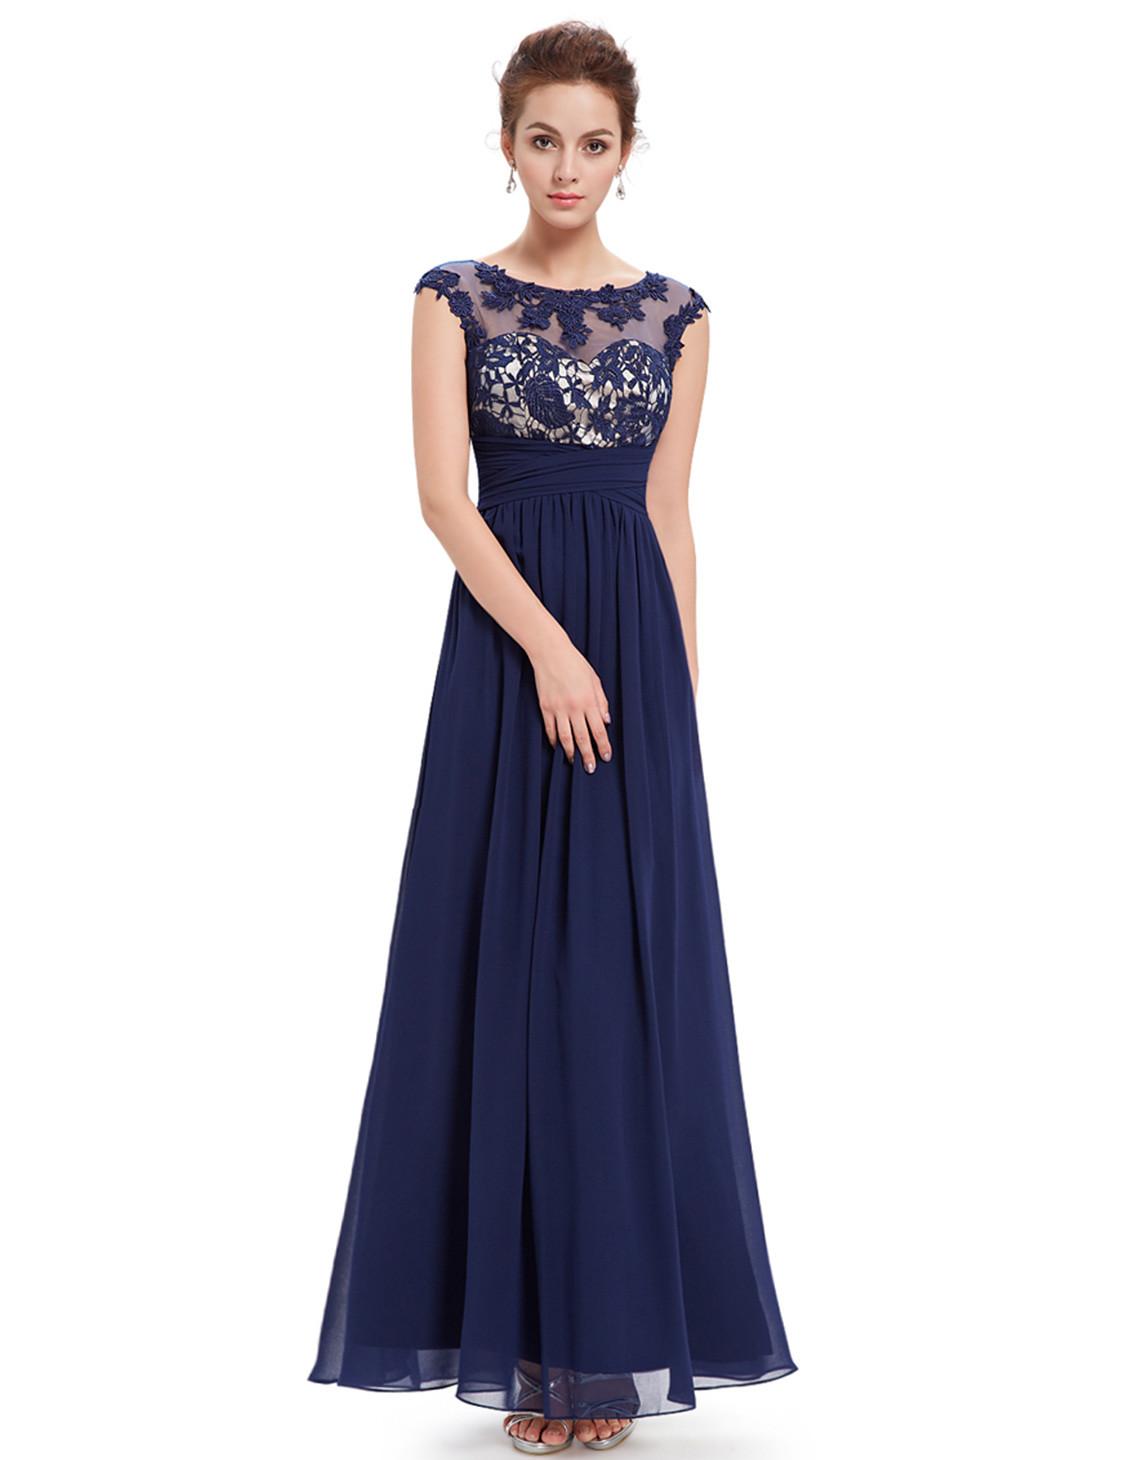 Elegant Lacy Bridesmaid Dress Navy